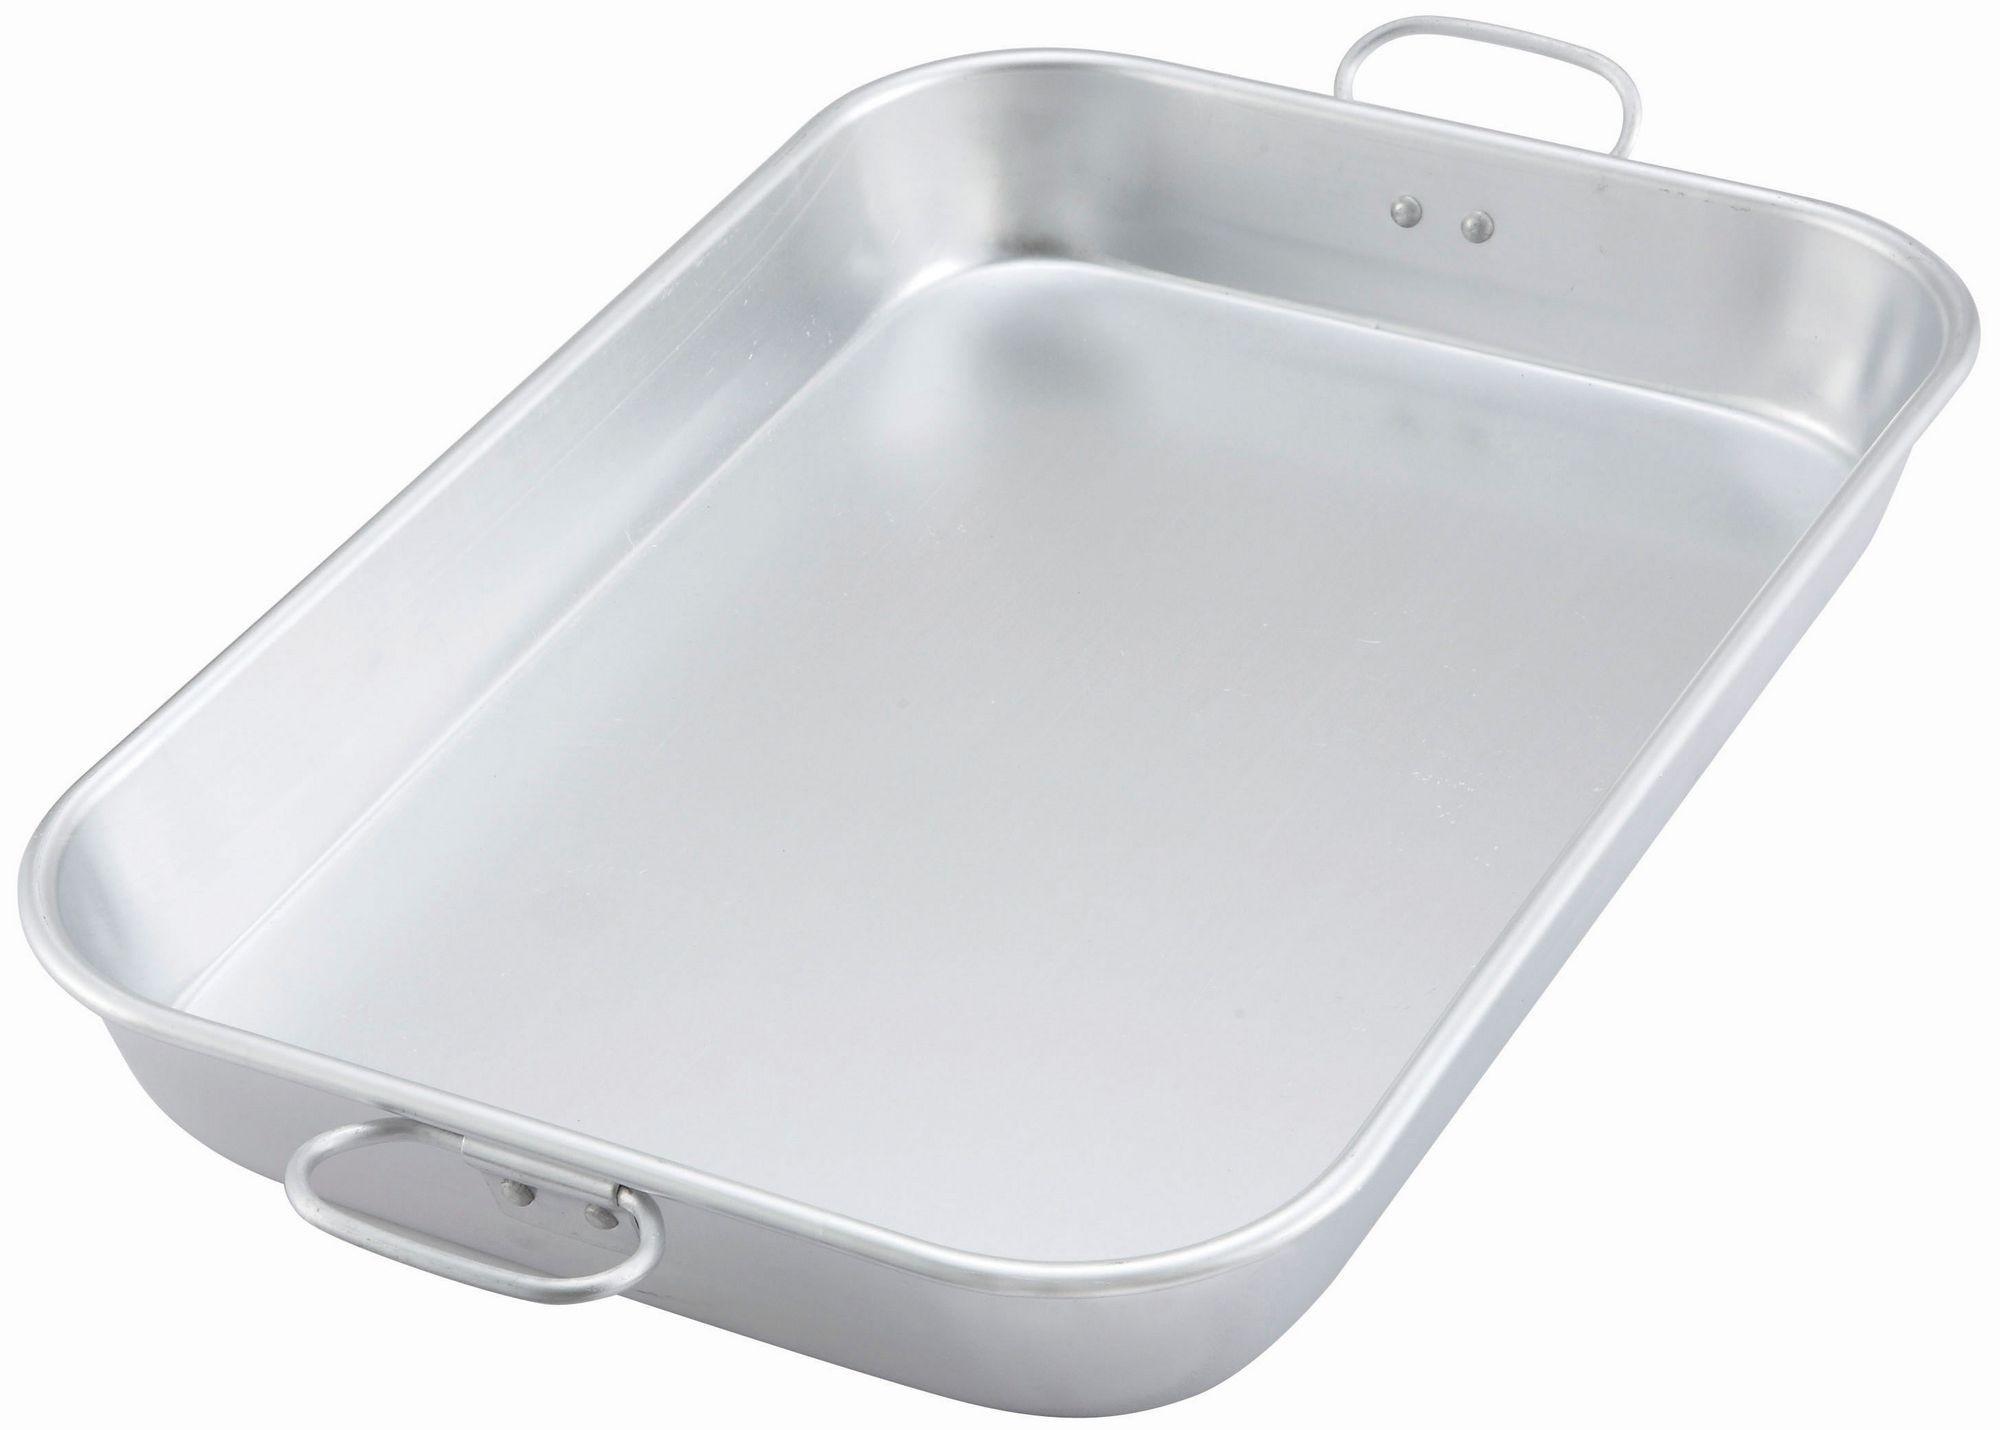 "Winco ALBP-1218 Aluminum Bake/Roasting Pan with Drop Handles, 17-3/4"" x 11-1/2"" x 2-1/4"